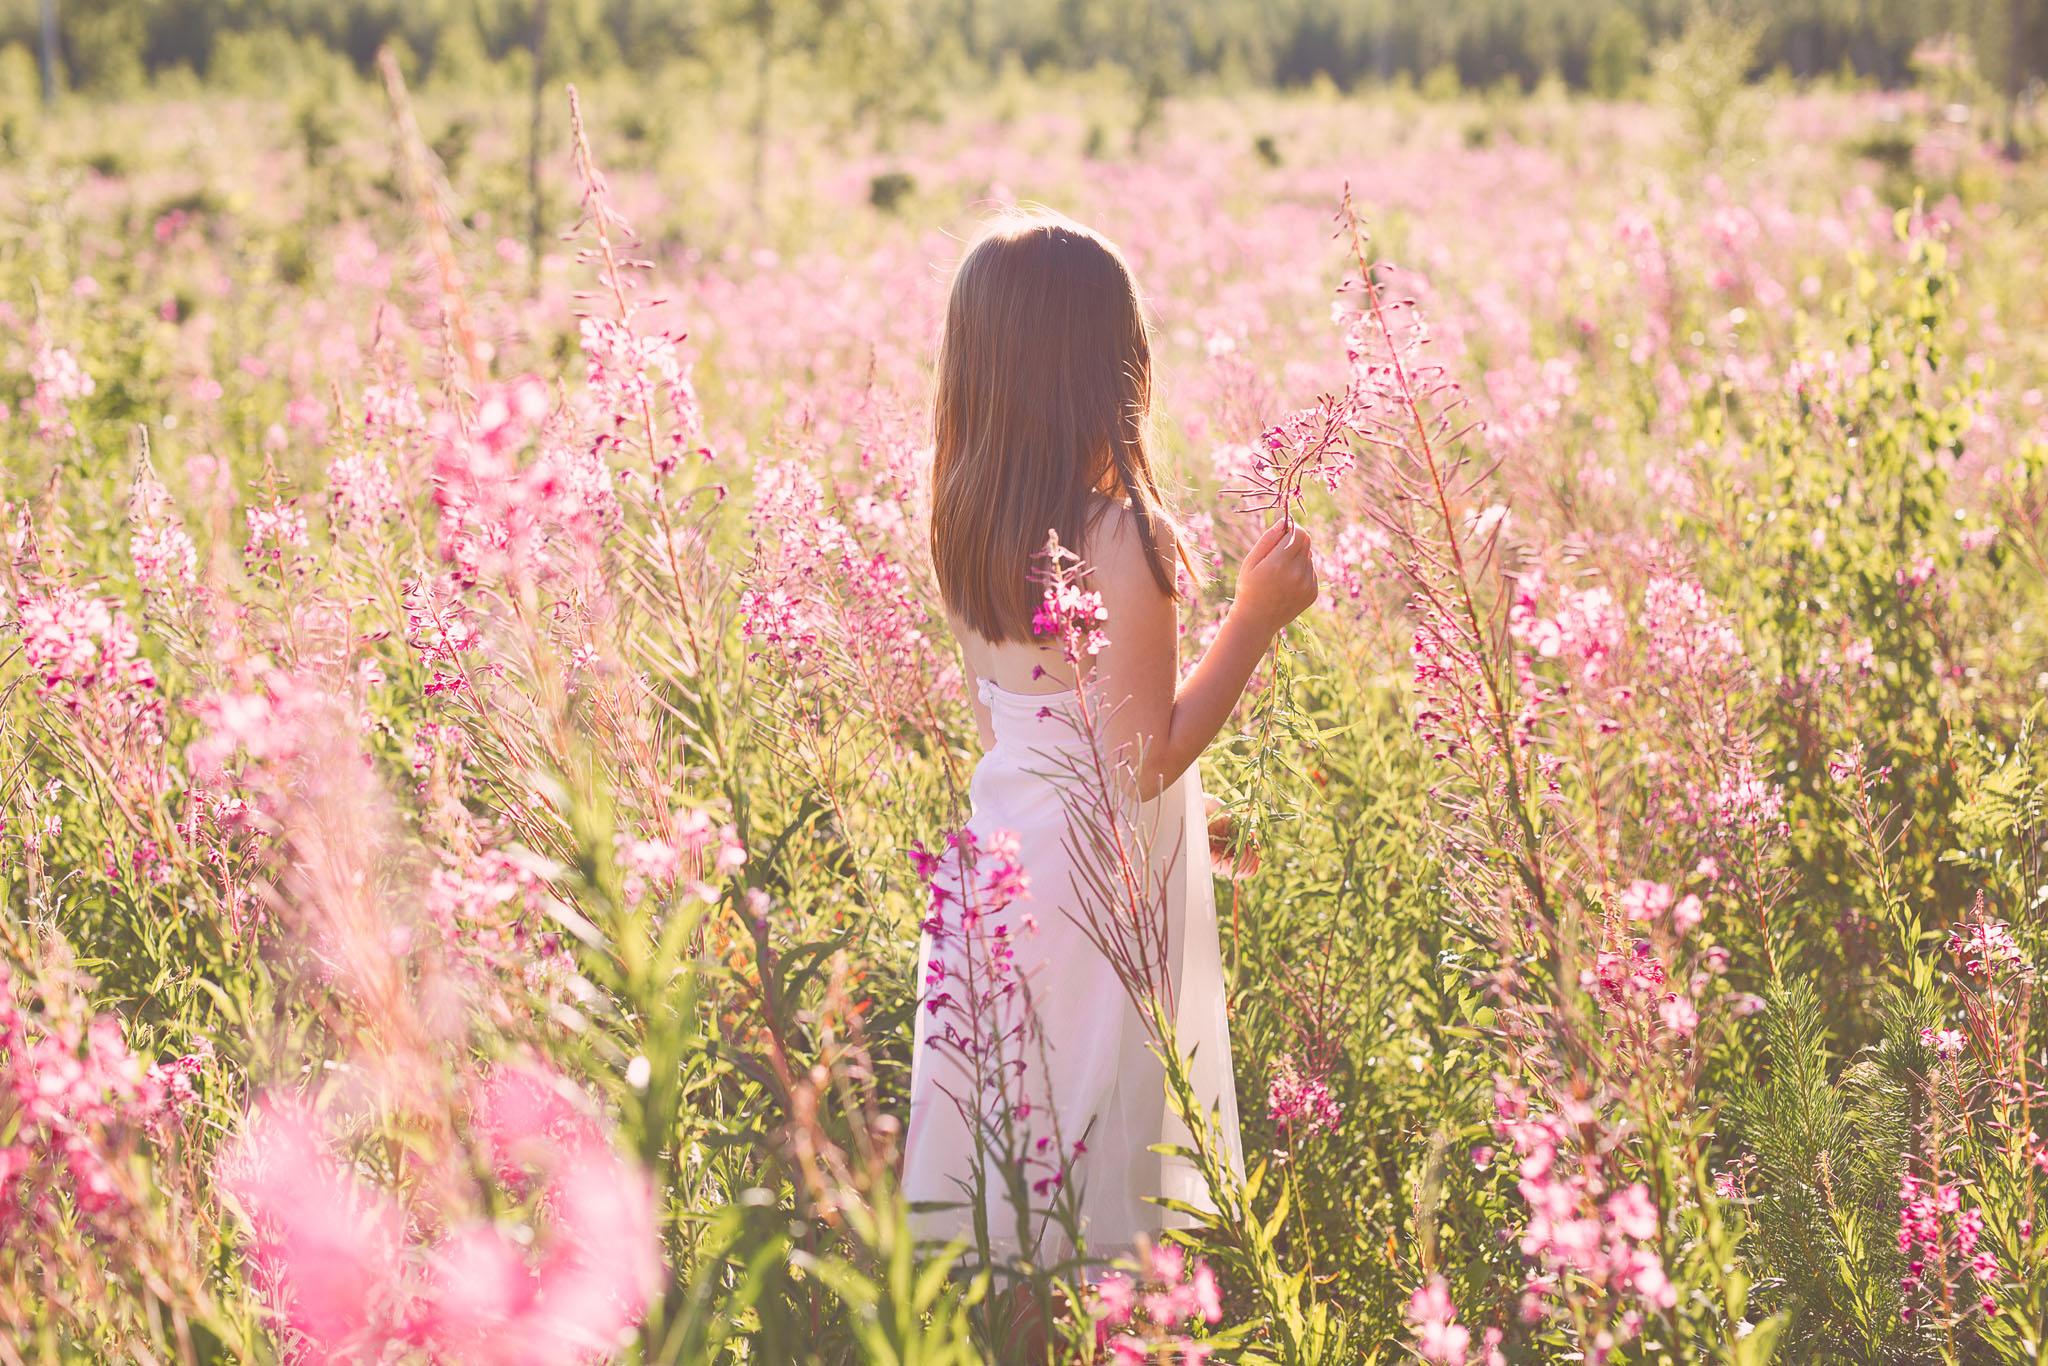 fotograf_sabina_wixner_hudiksvall_barn_familj_5.jpg